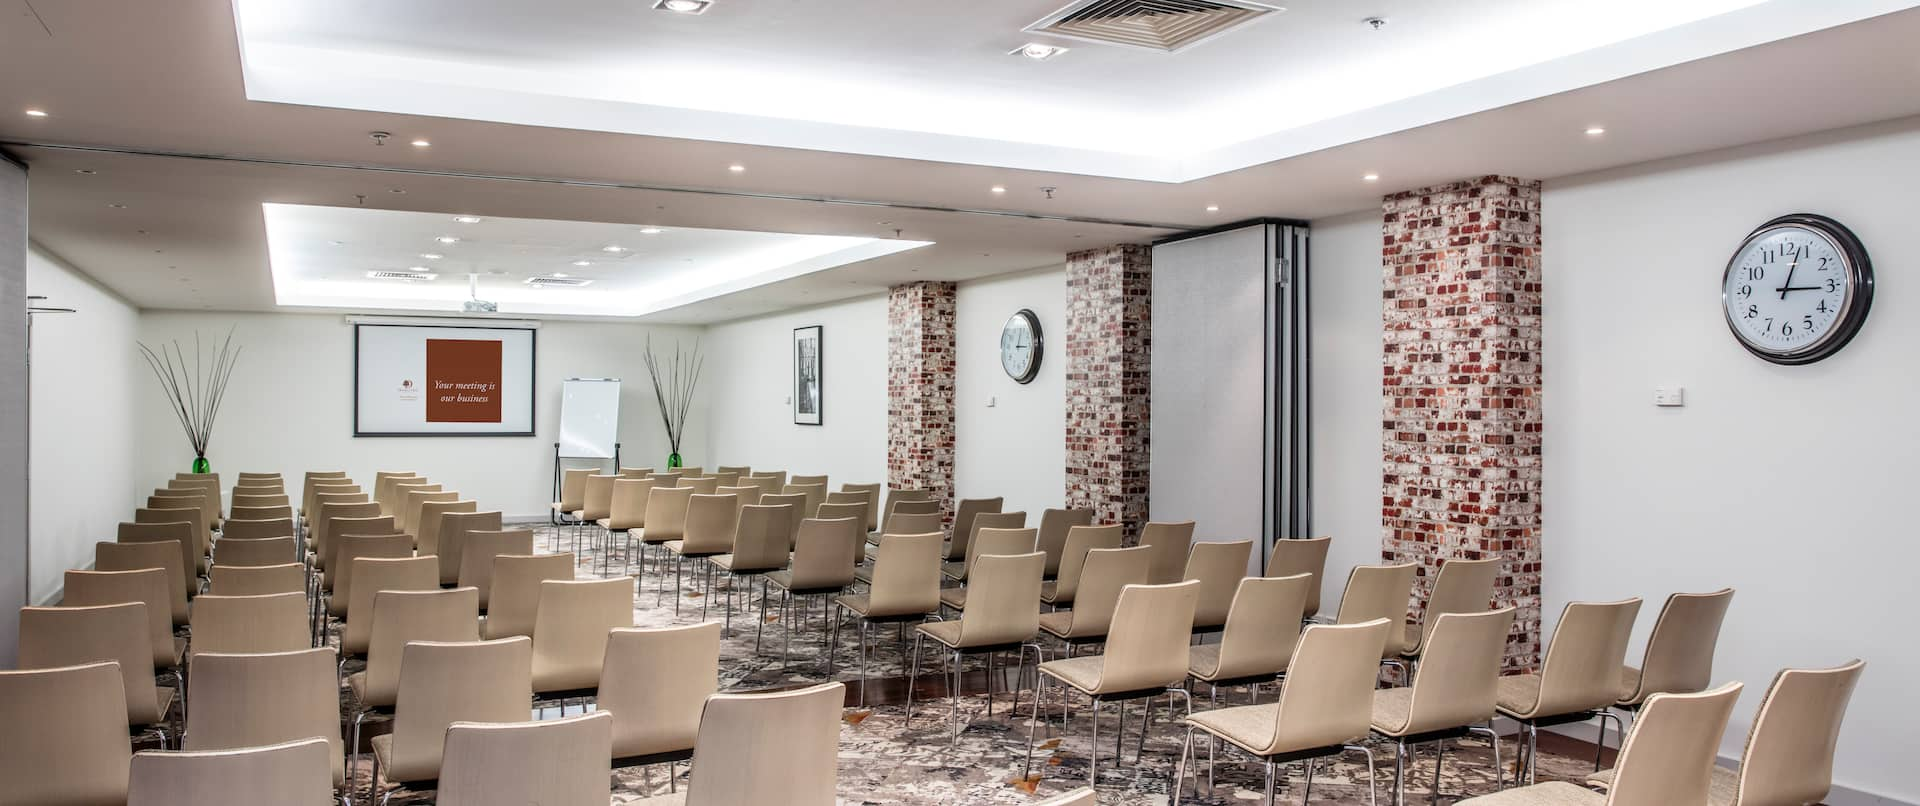 Meeting Room Theatre